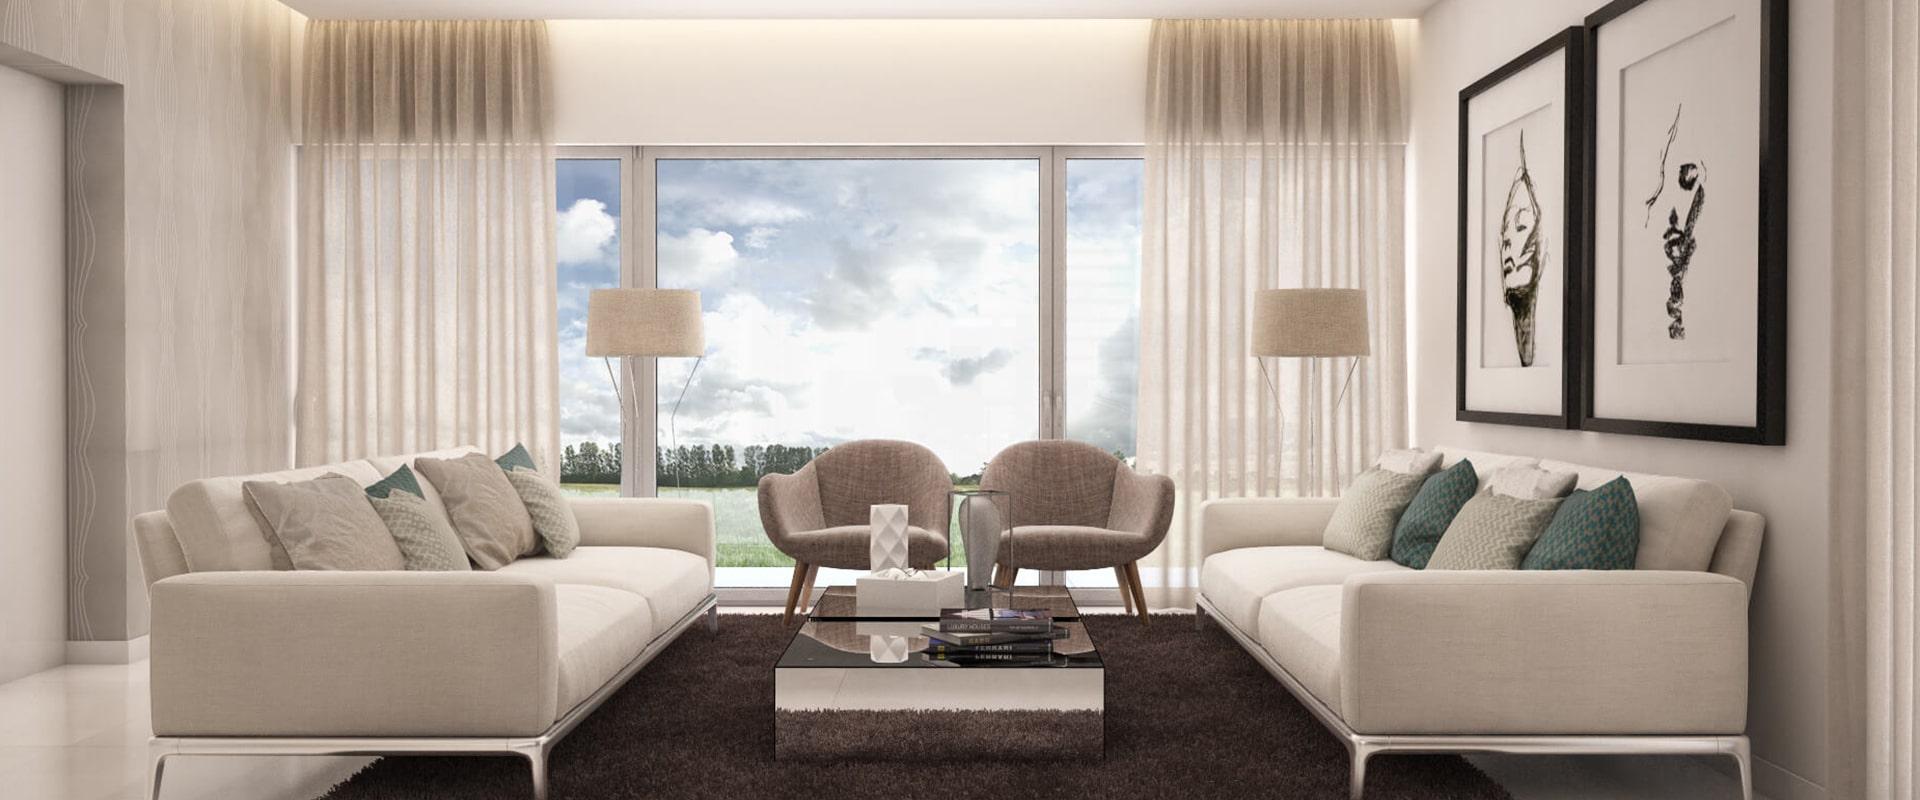 Sala estilo contemporâneo